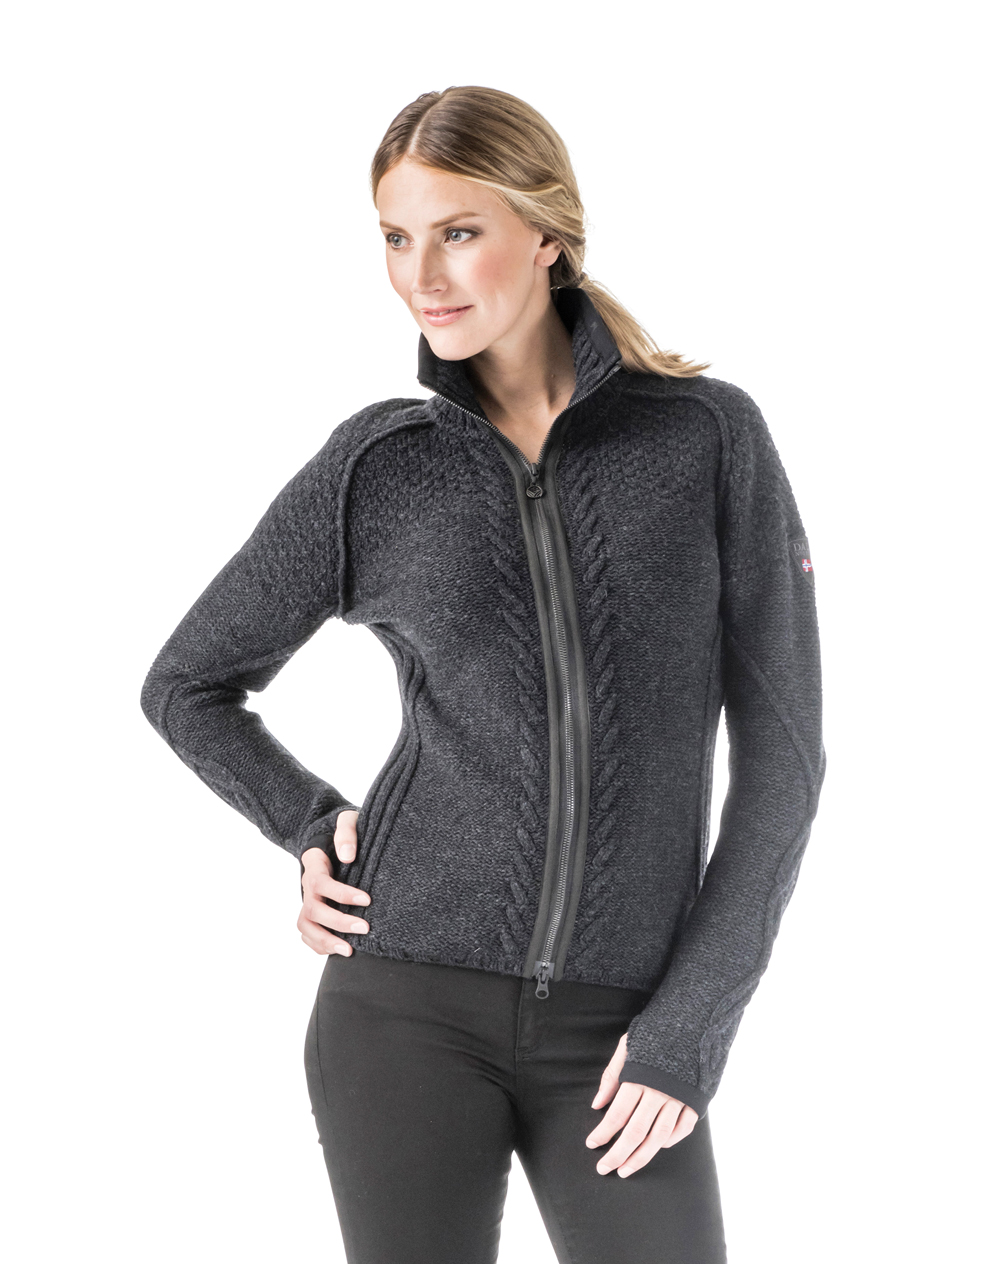 Viking Women's Jacket